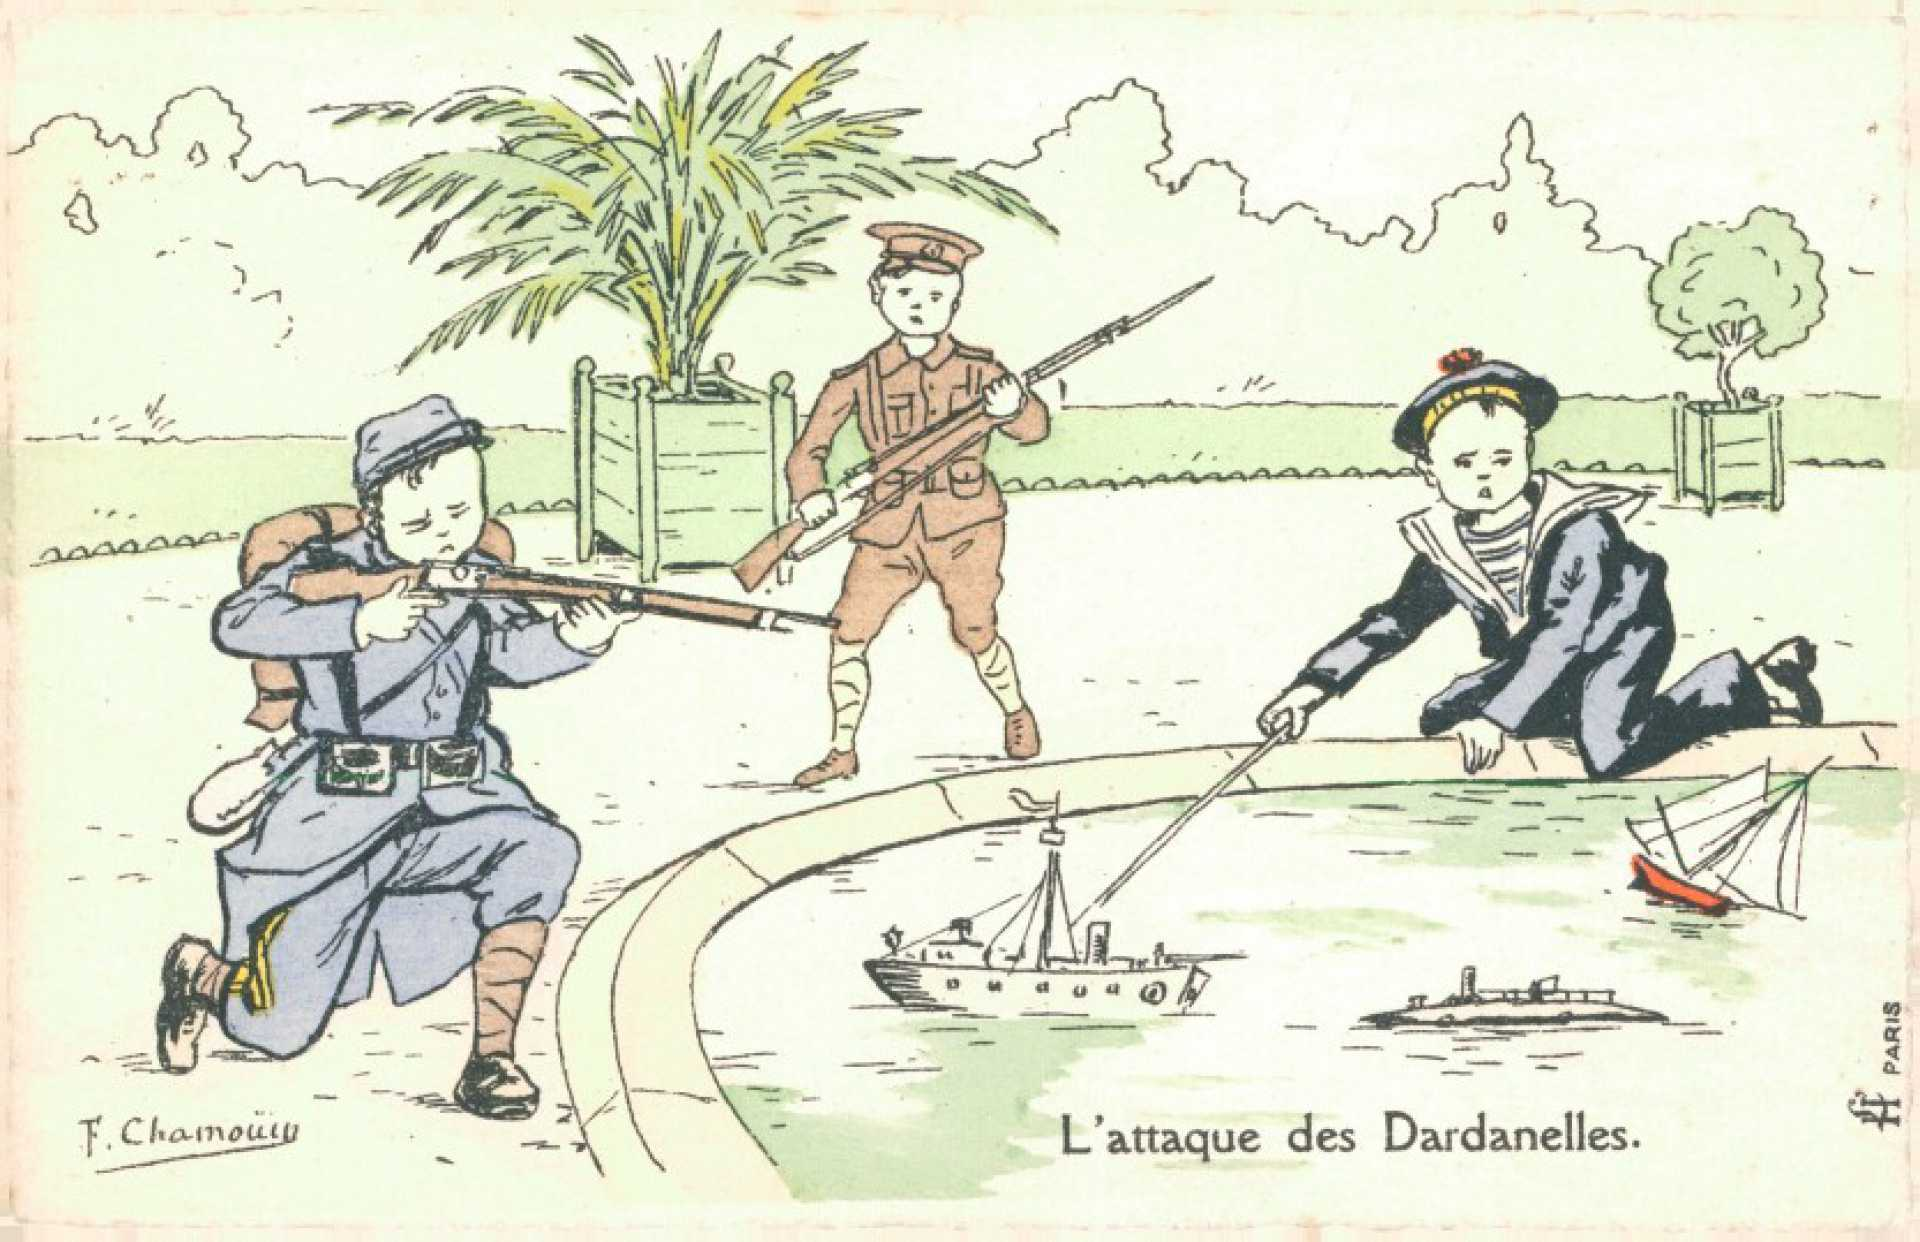 L'attaque des Dardanelles